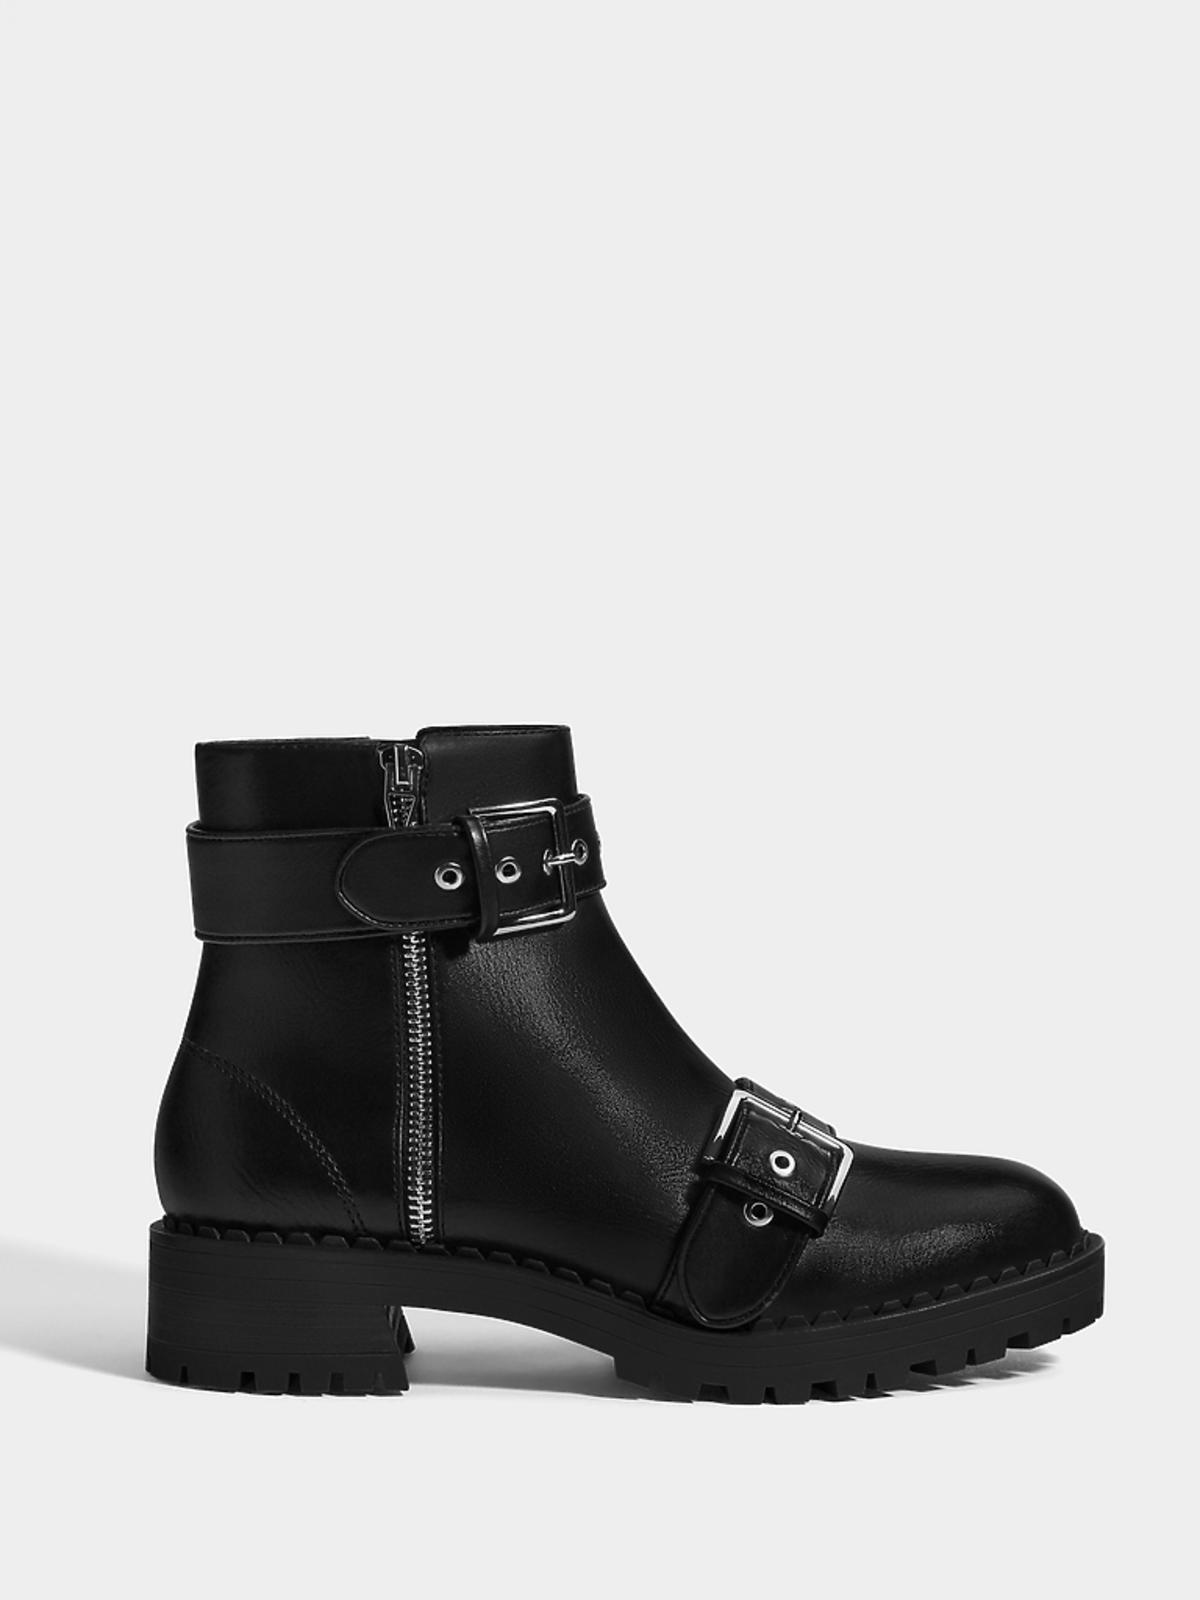 buty rockowe z klamrami Bershka